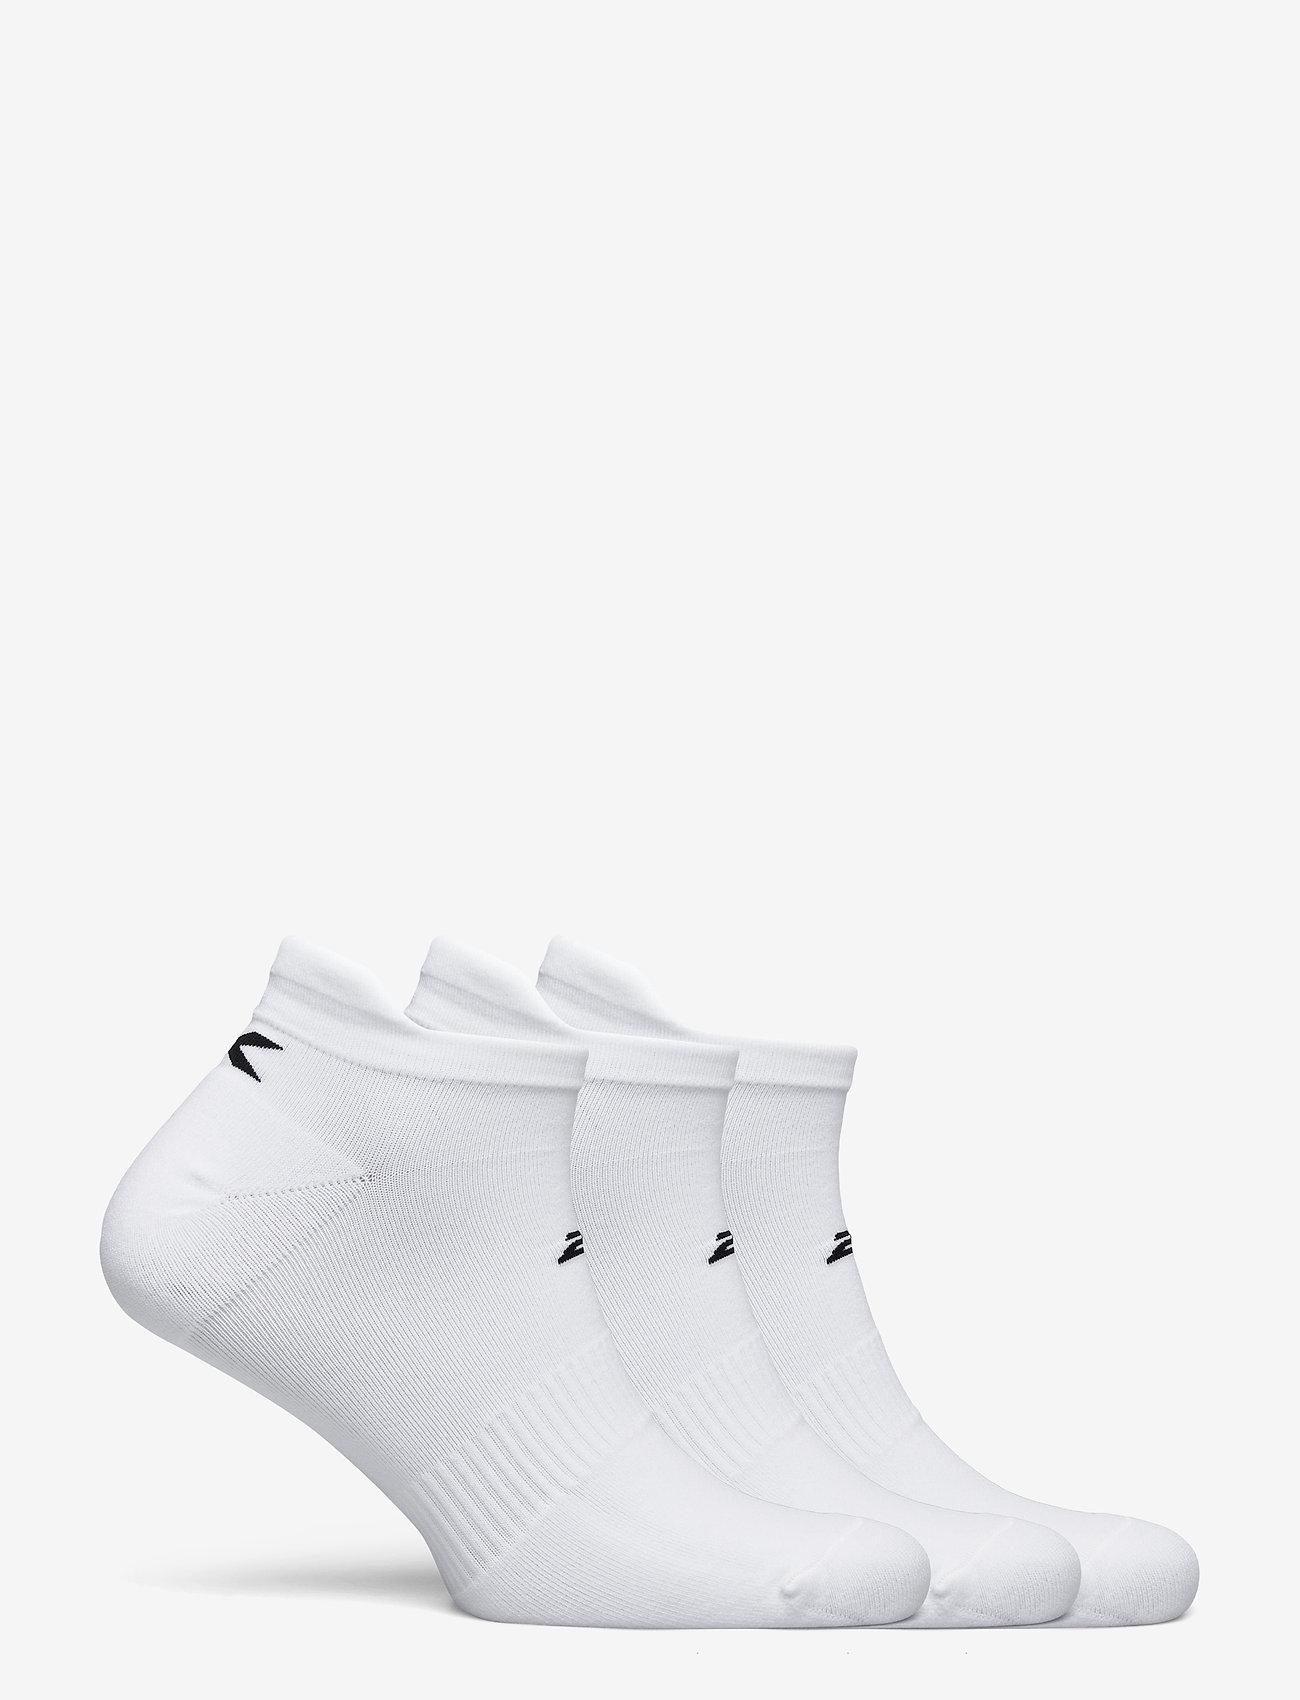 2XU - ANKLE SOCKS 3 PACK - ankelstrumpor - white/black - 1